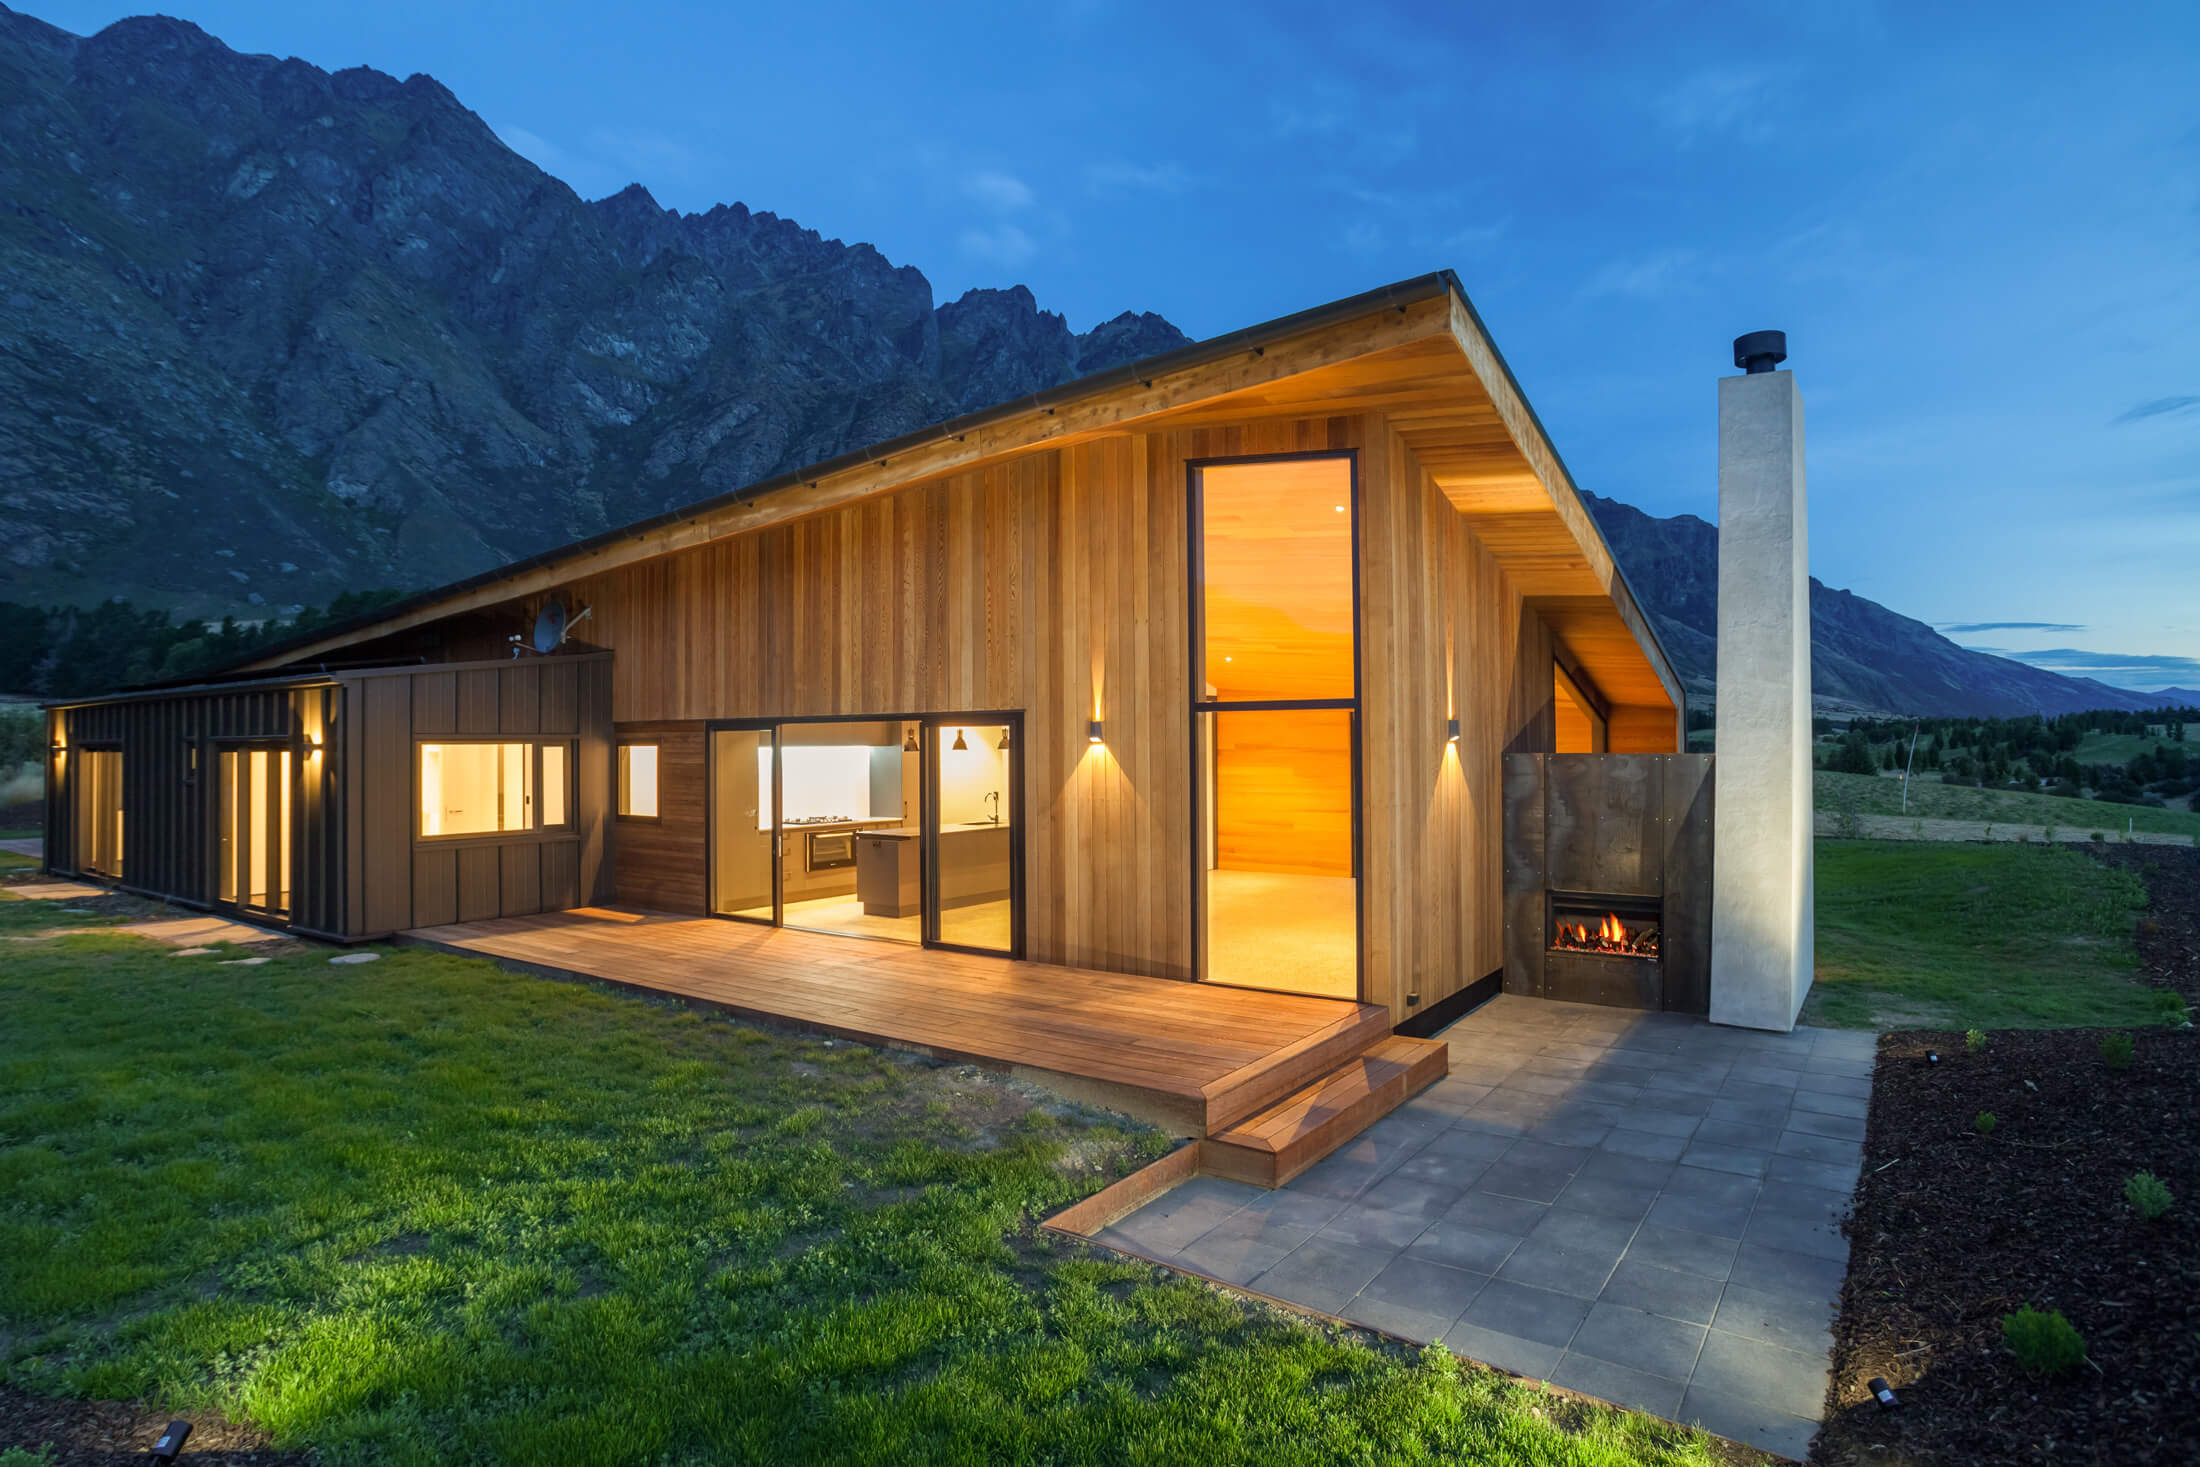 Herron-Bach-GARDEN-VIEW-house-night-custom-customer-unique-designer-architect-chimney-mountain.jpg